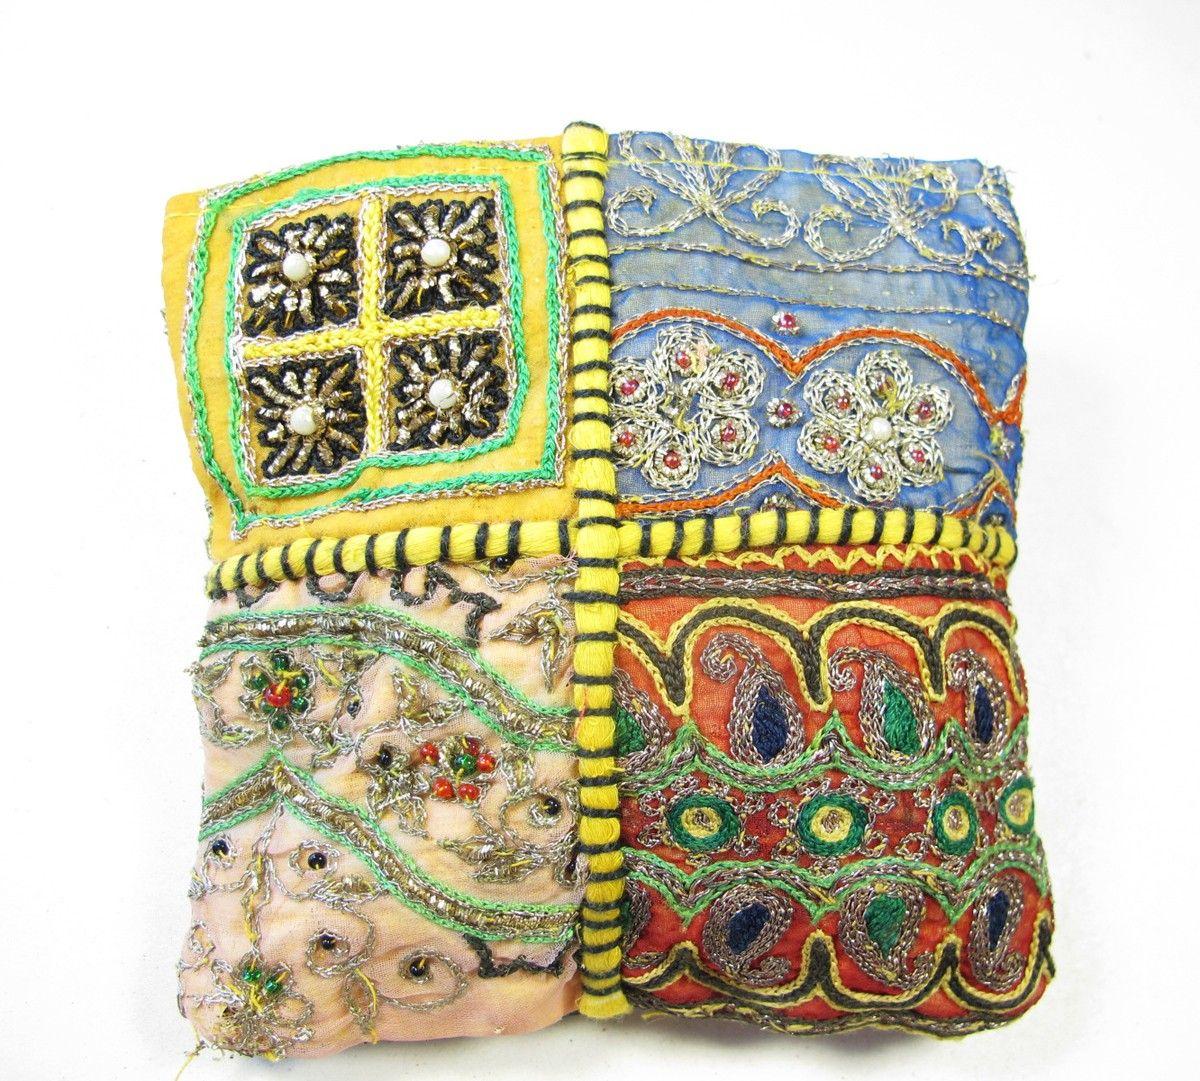 porte-monnaie en tissu indien brodé